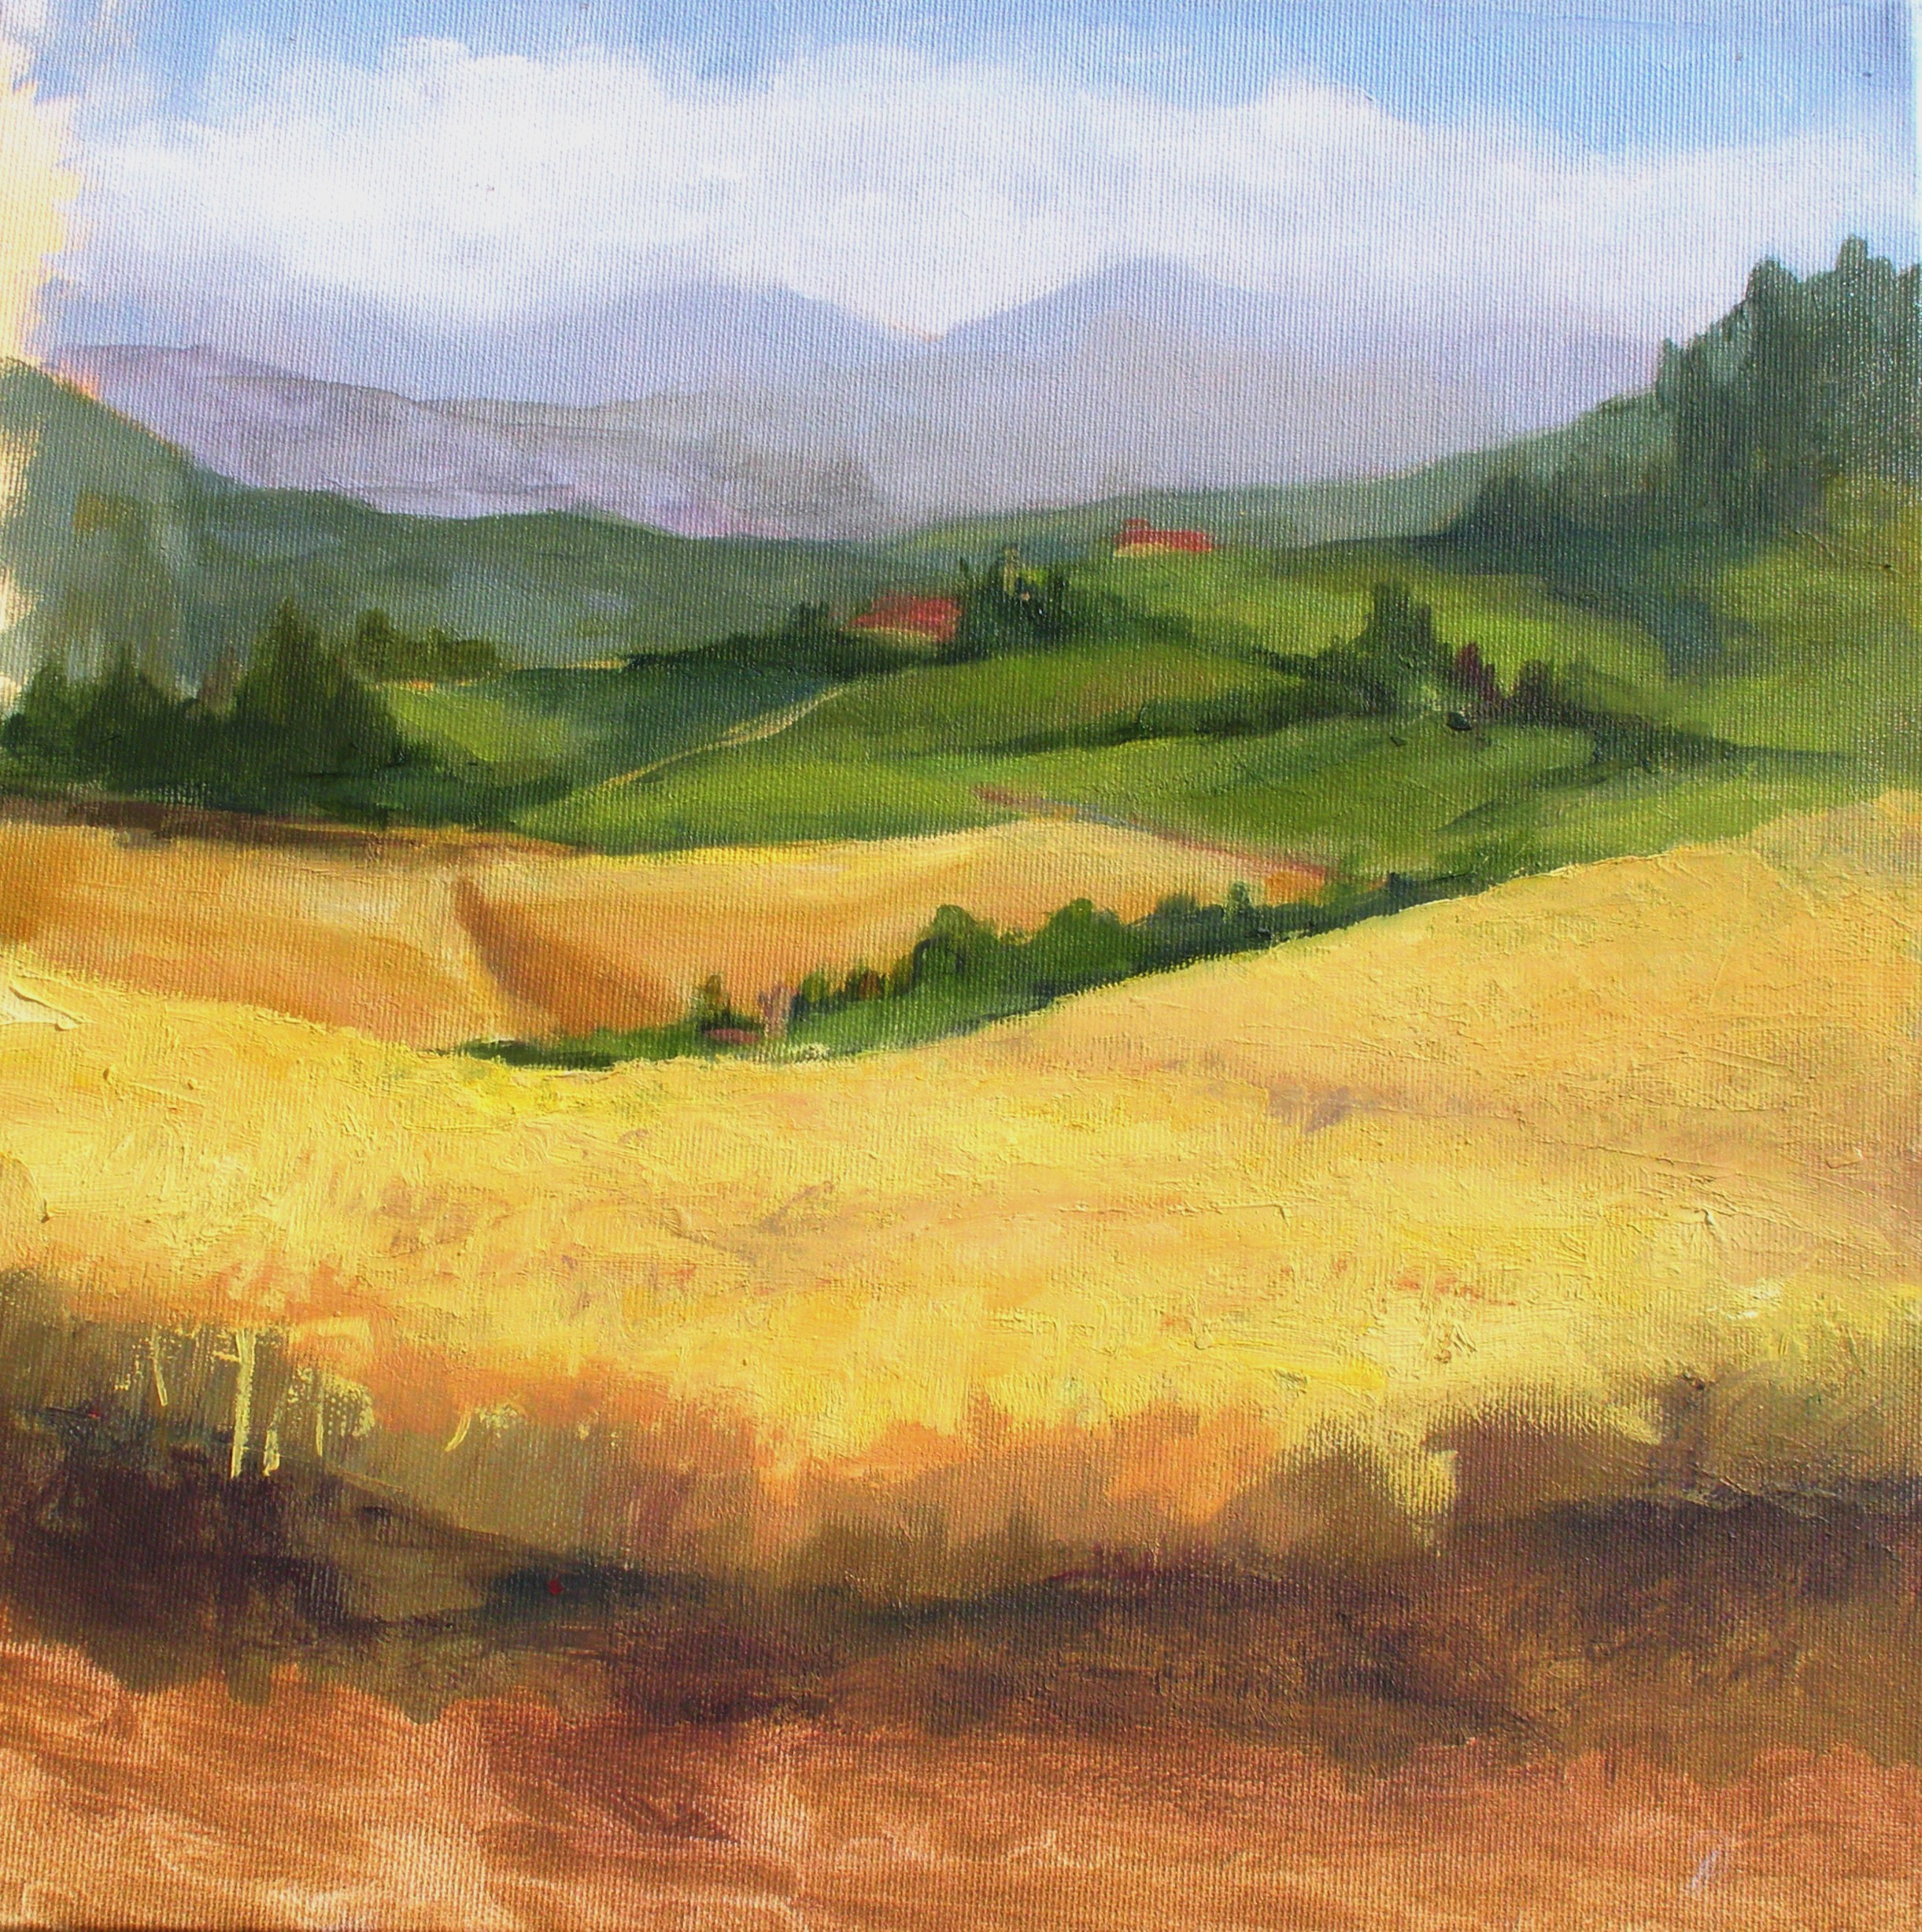 wheat fields, Italy 2017